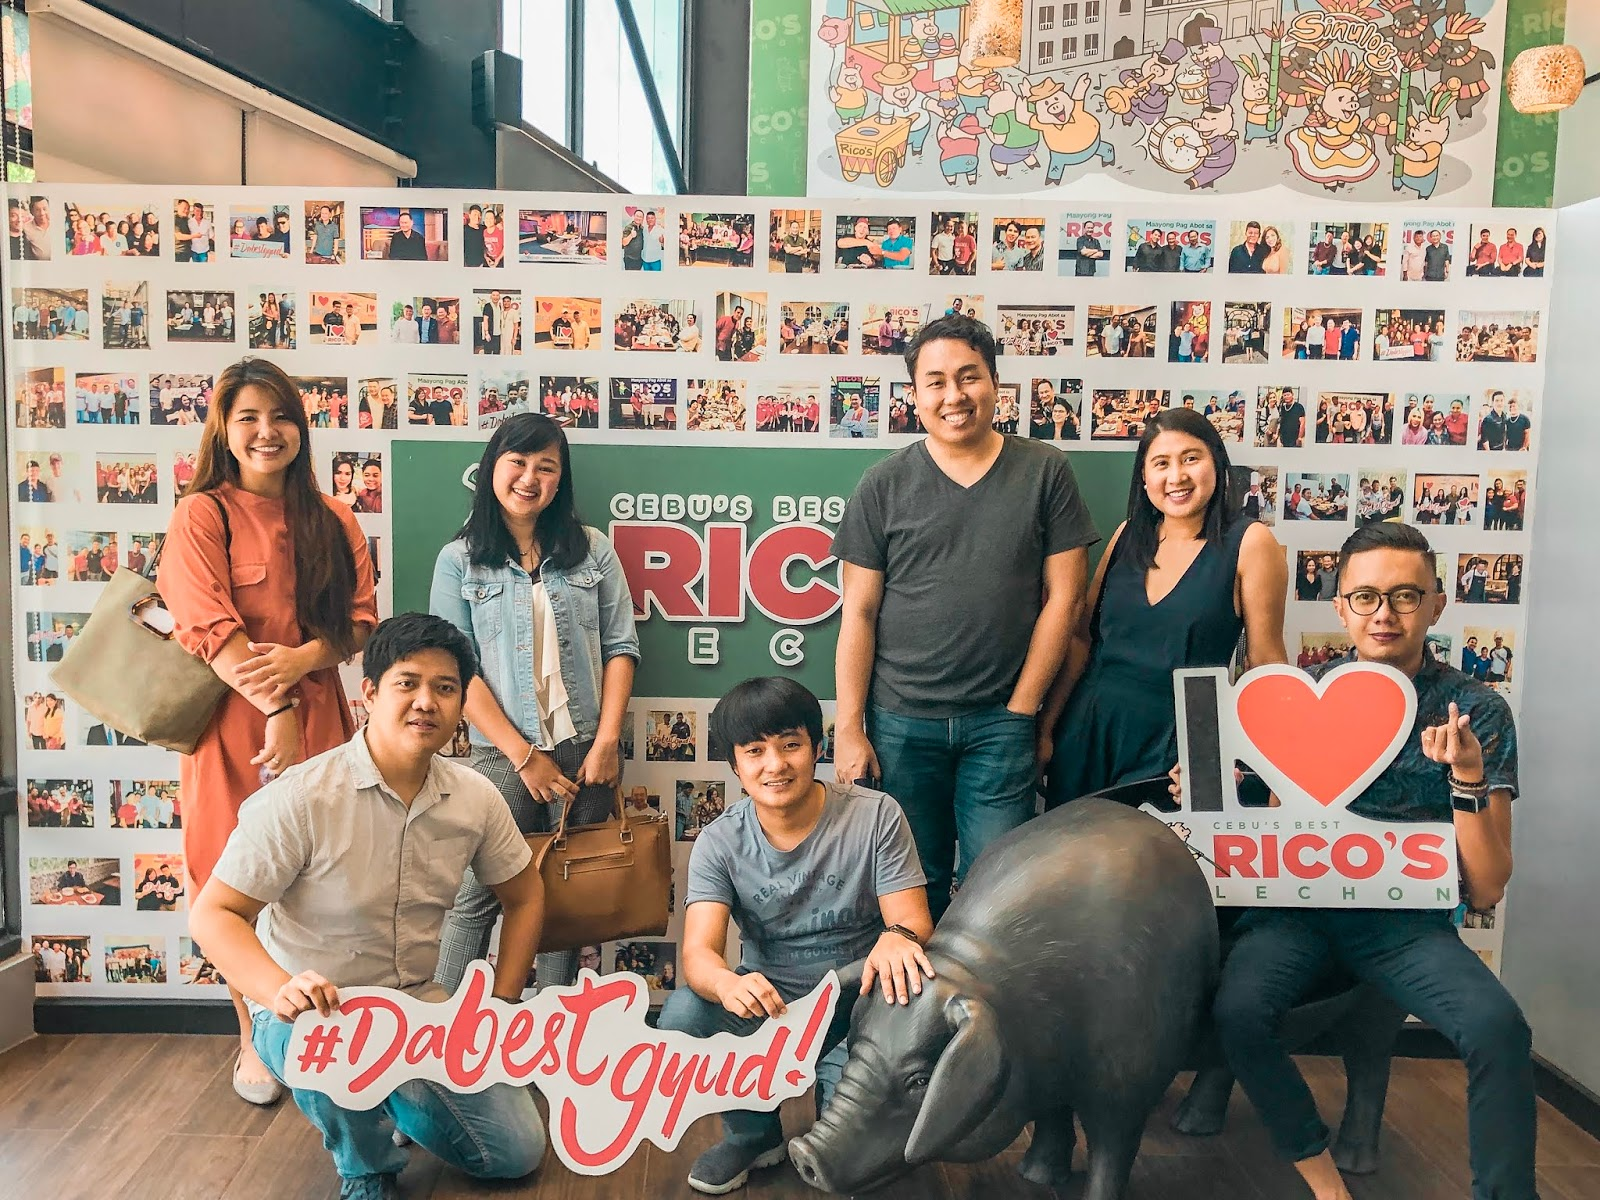 Rico's Lechon: Mandaue Branch, Flagship Store